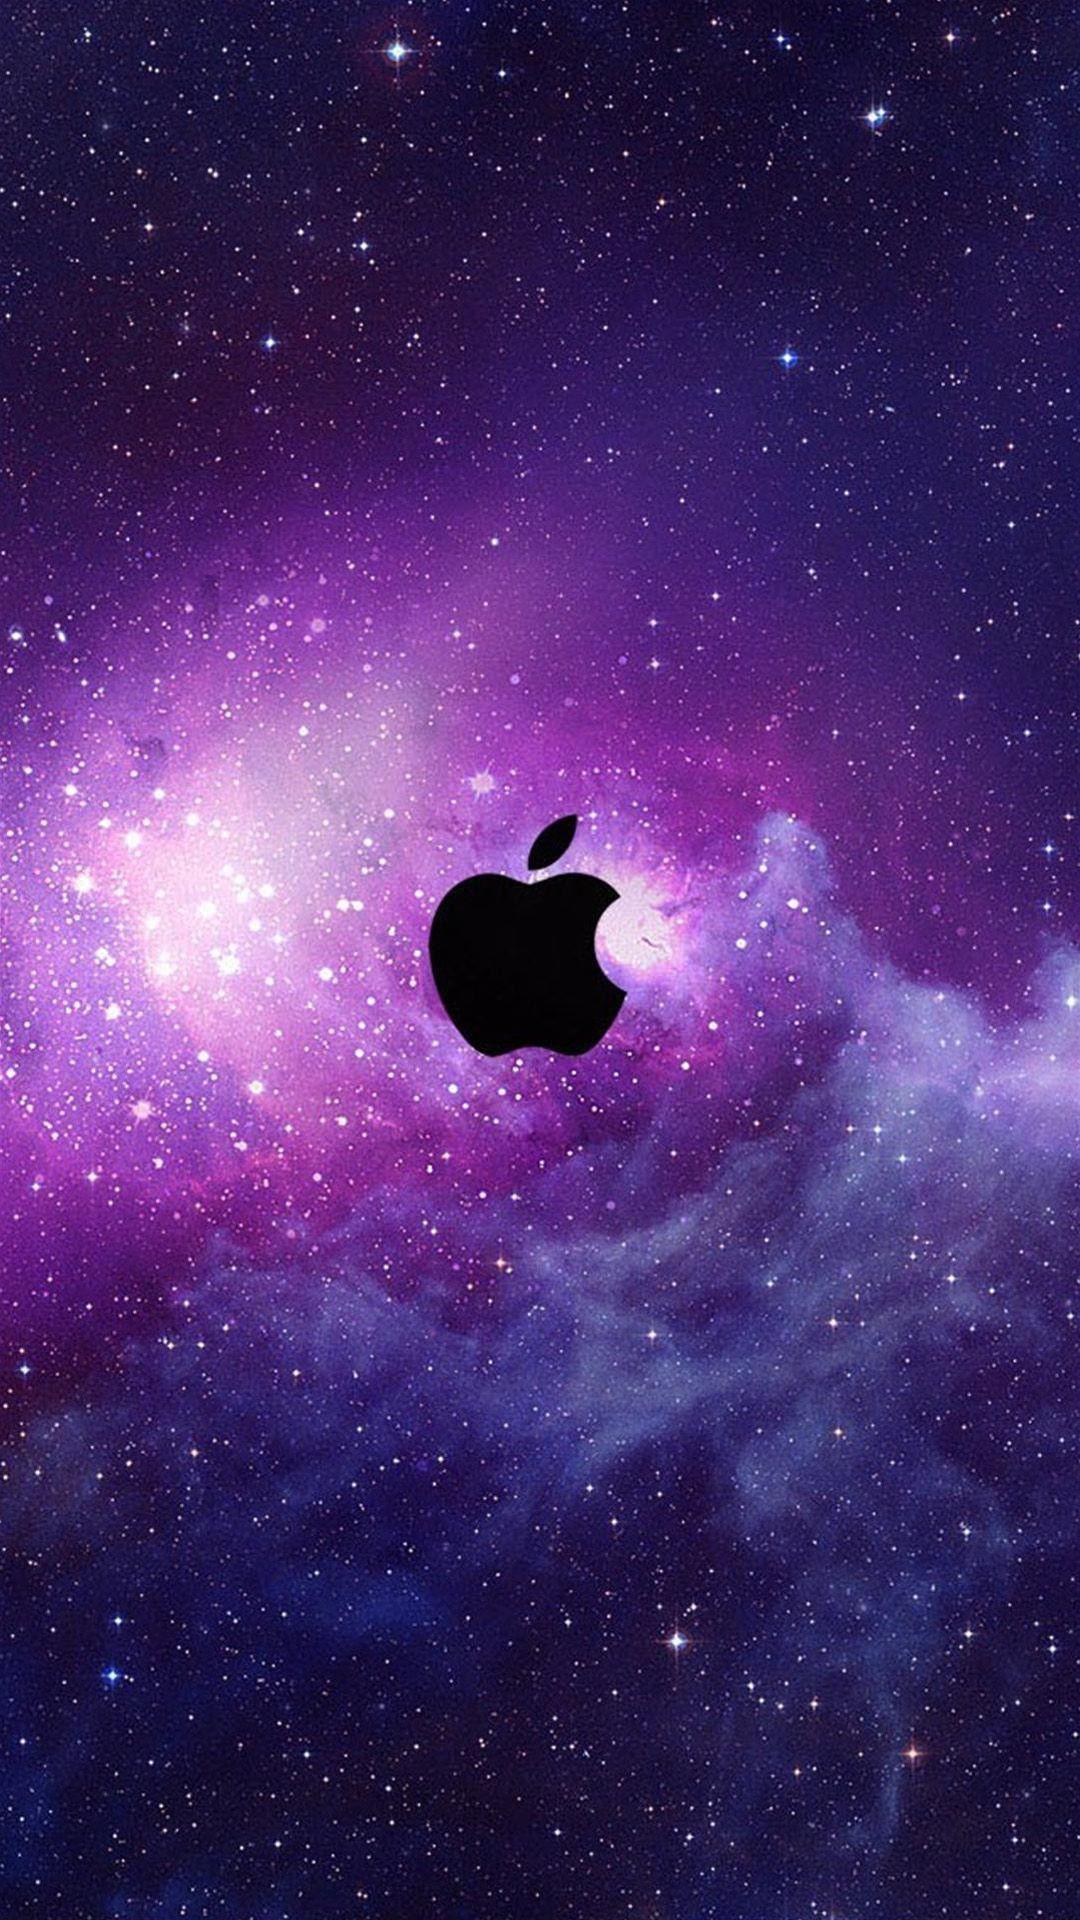 View source image Apple wallpaper iphone, Apple logo